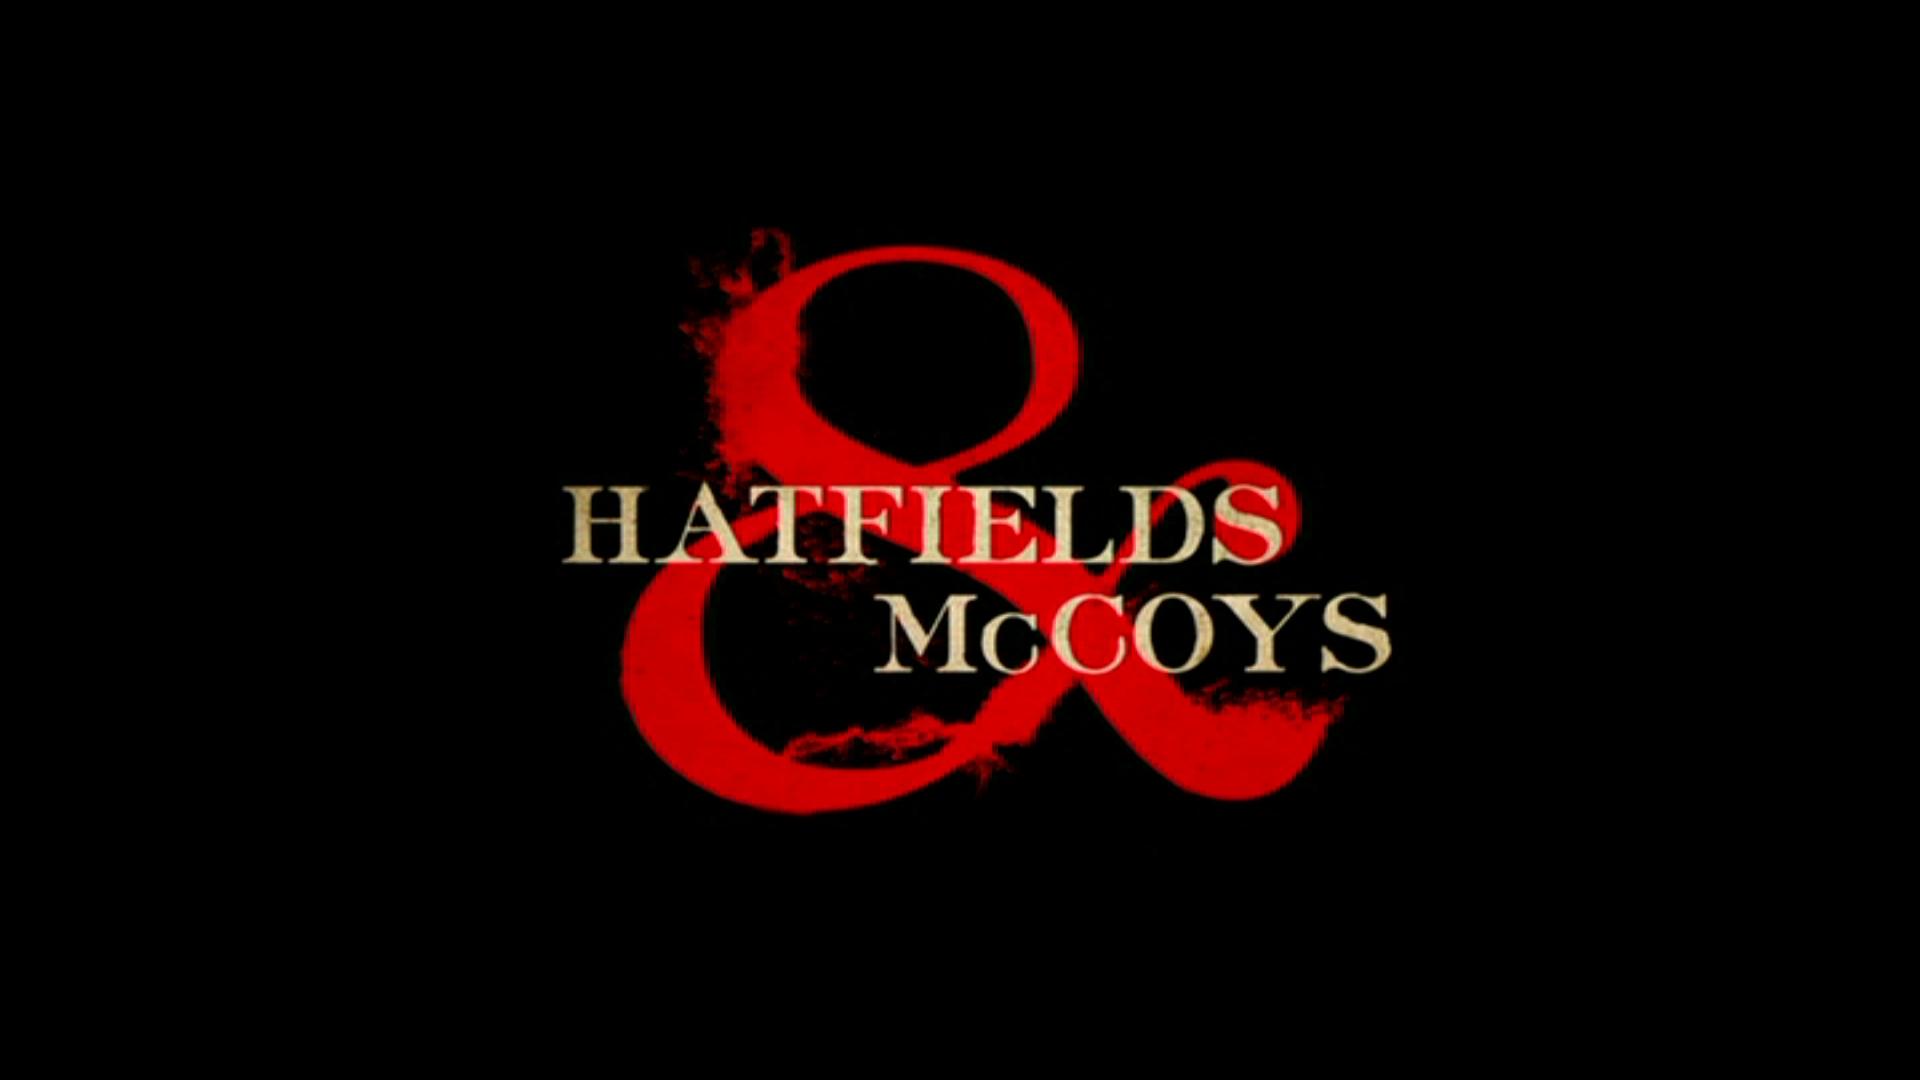 McCoys Infinite McCoys